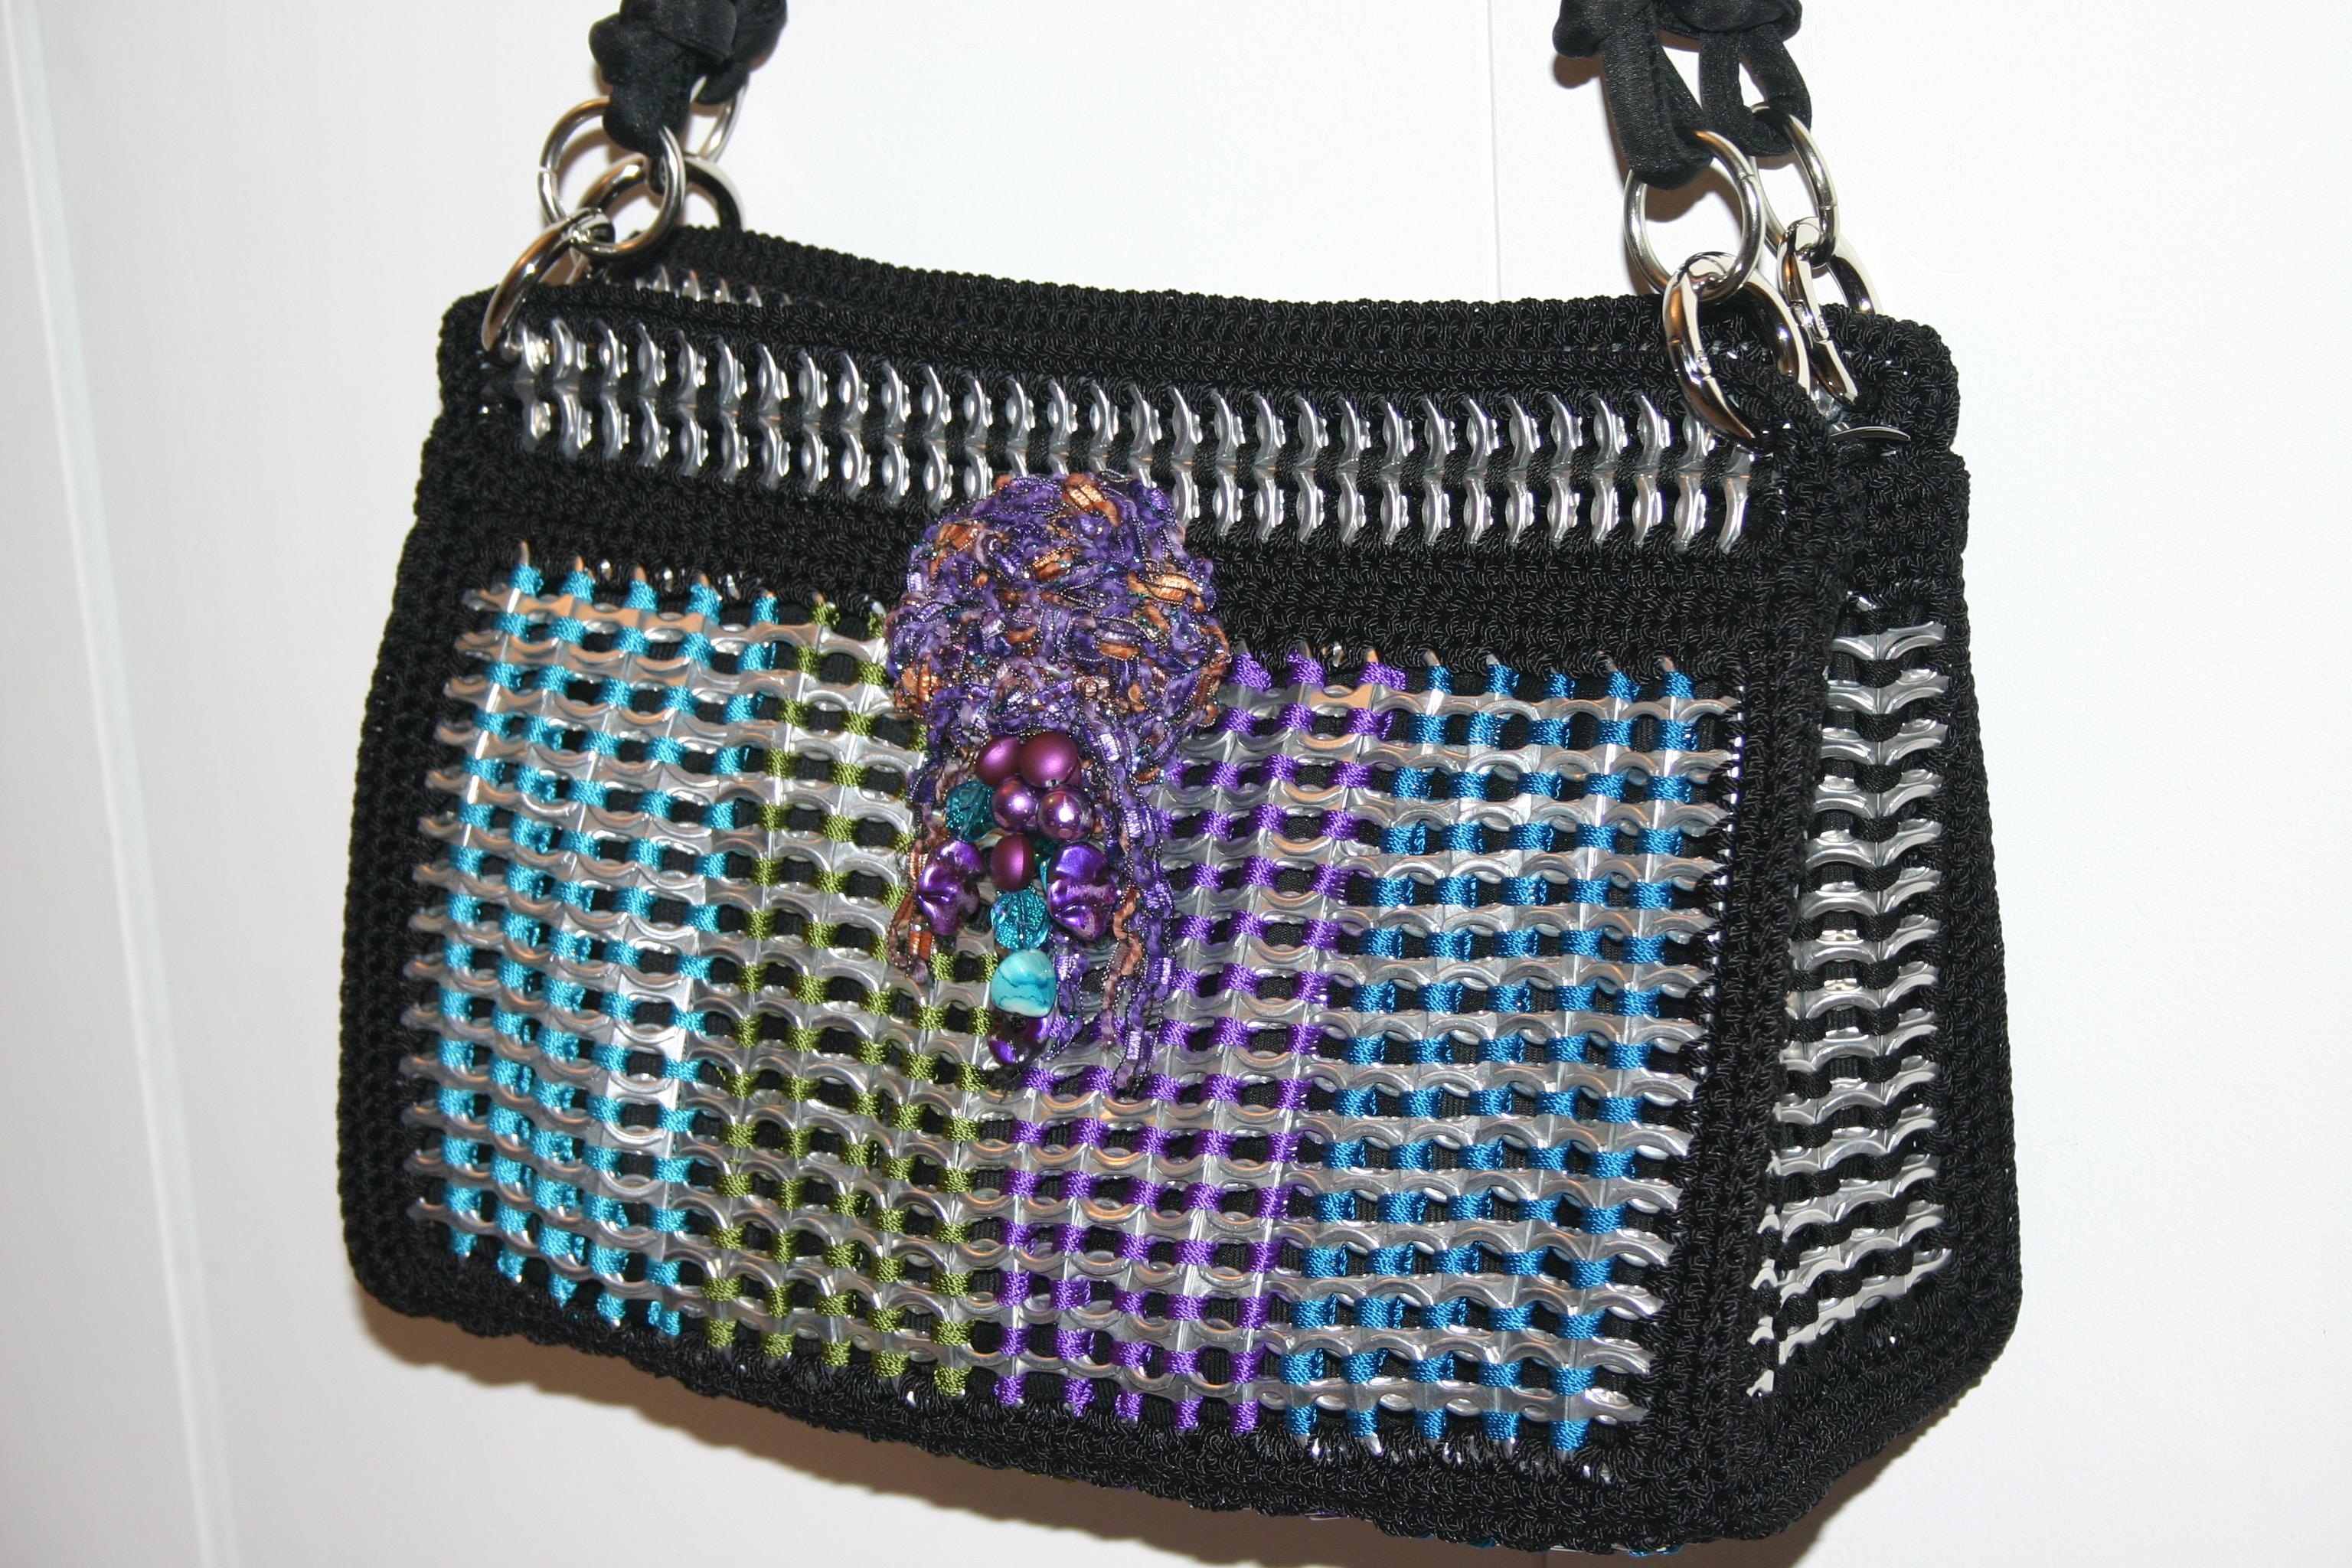 Pams bags